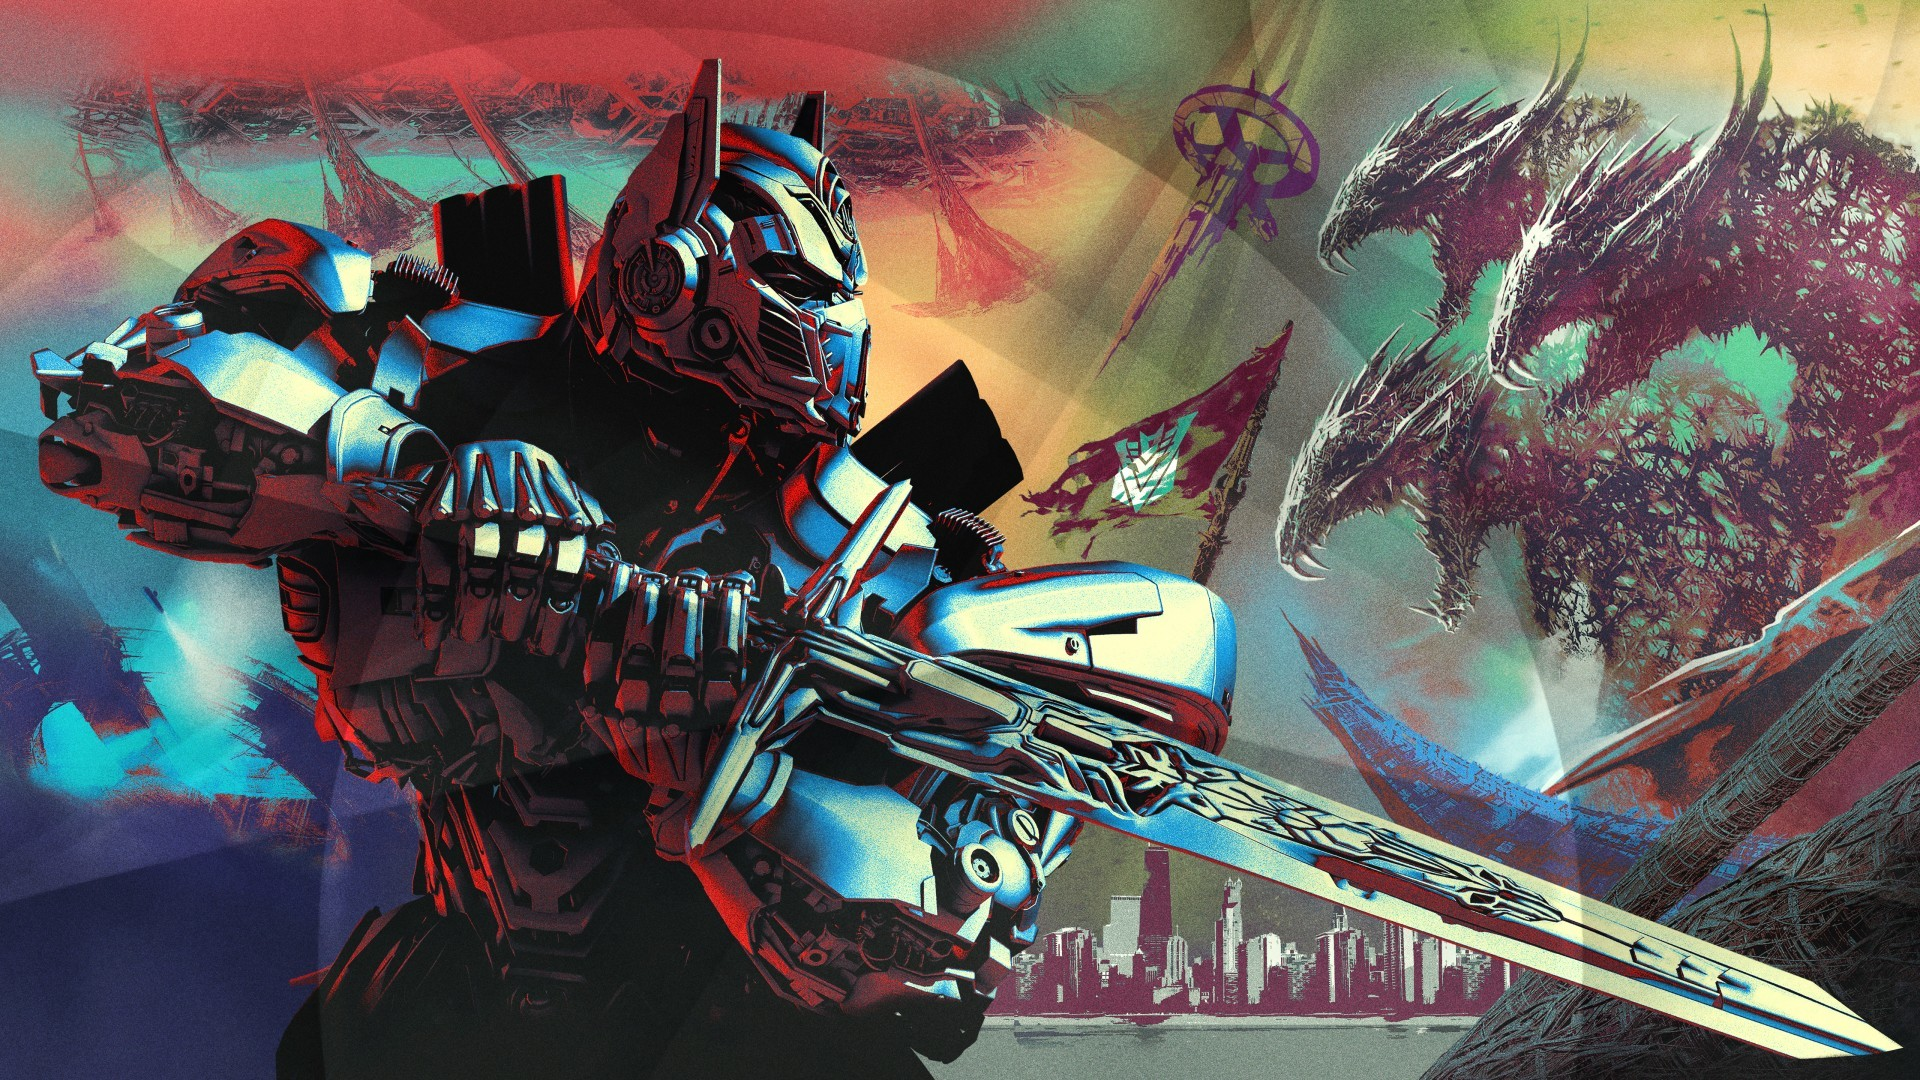 Wallpaper Optimus Prime, Transformers: The Last Knight, 2017 Movies,  Poster, 4K, 5K, Movies, #2209